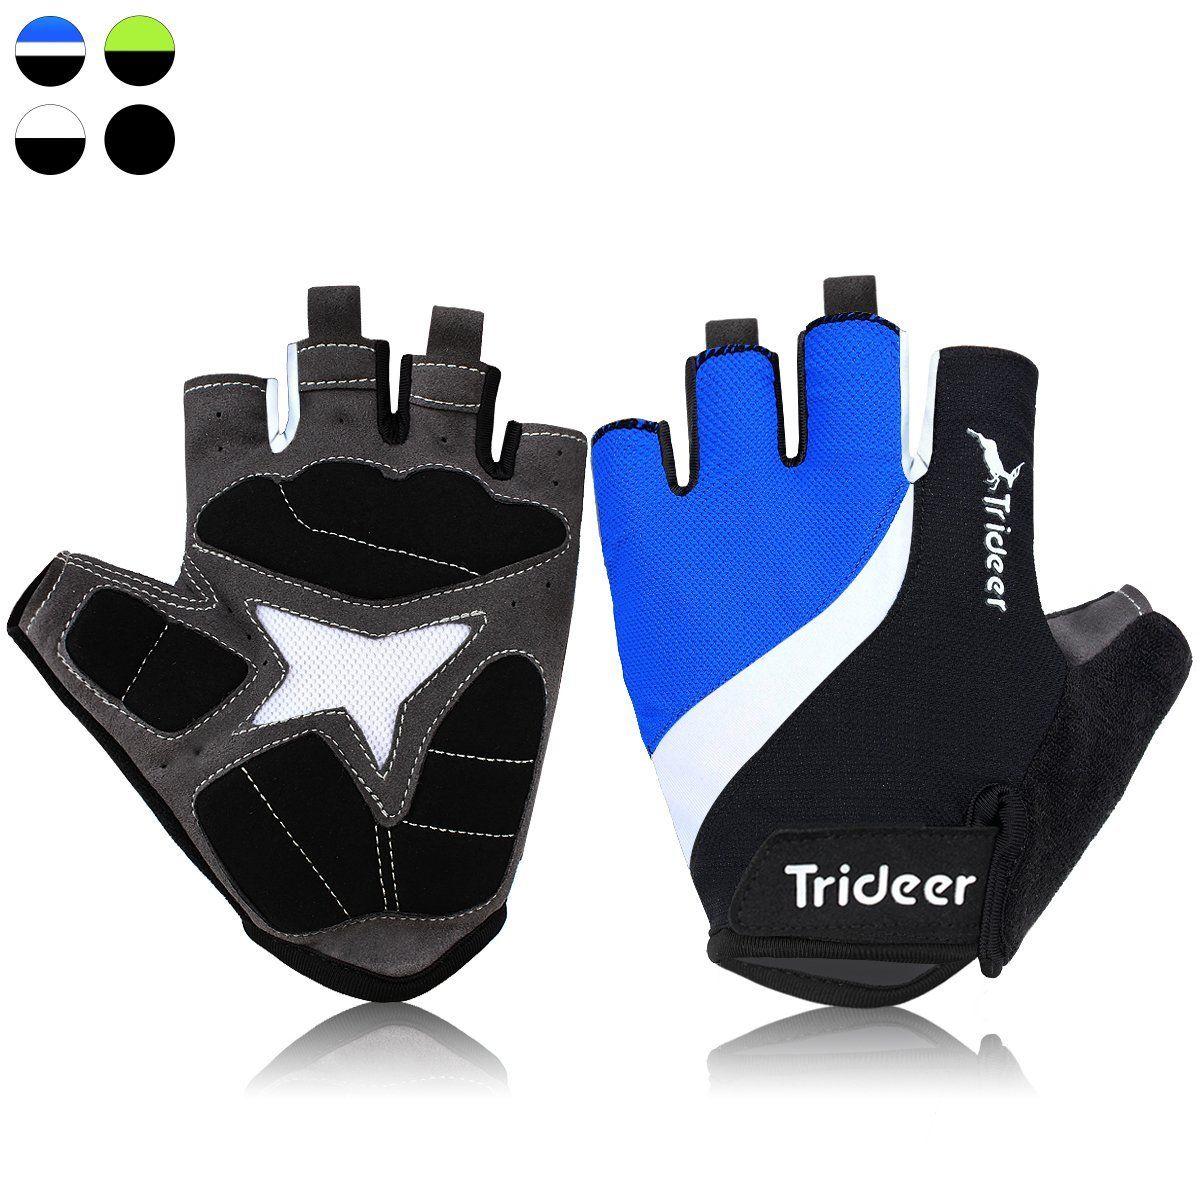 Trideer Cycling Biking Bike MTB Half Finger Gloves Black Blue White XL Gel Palm